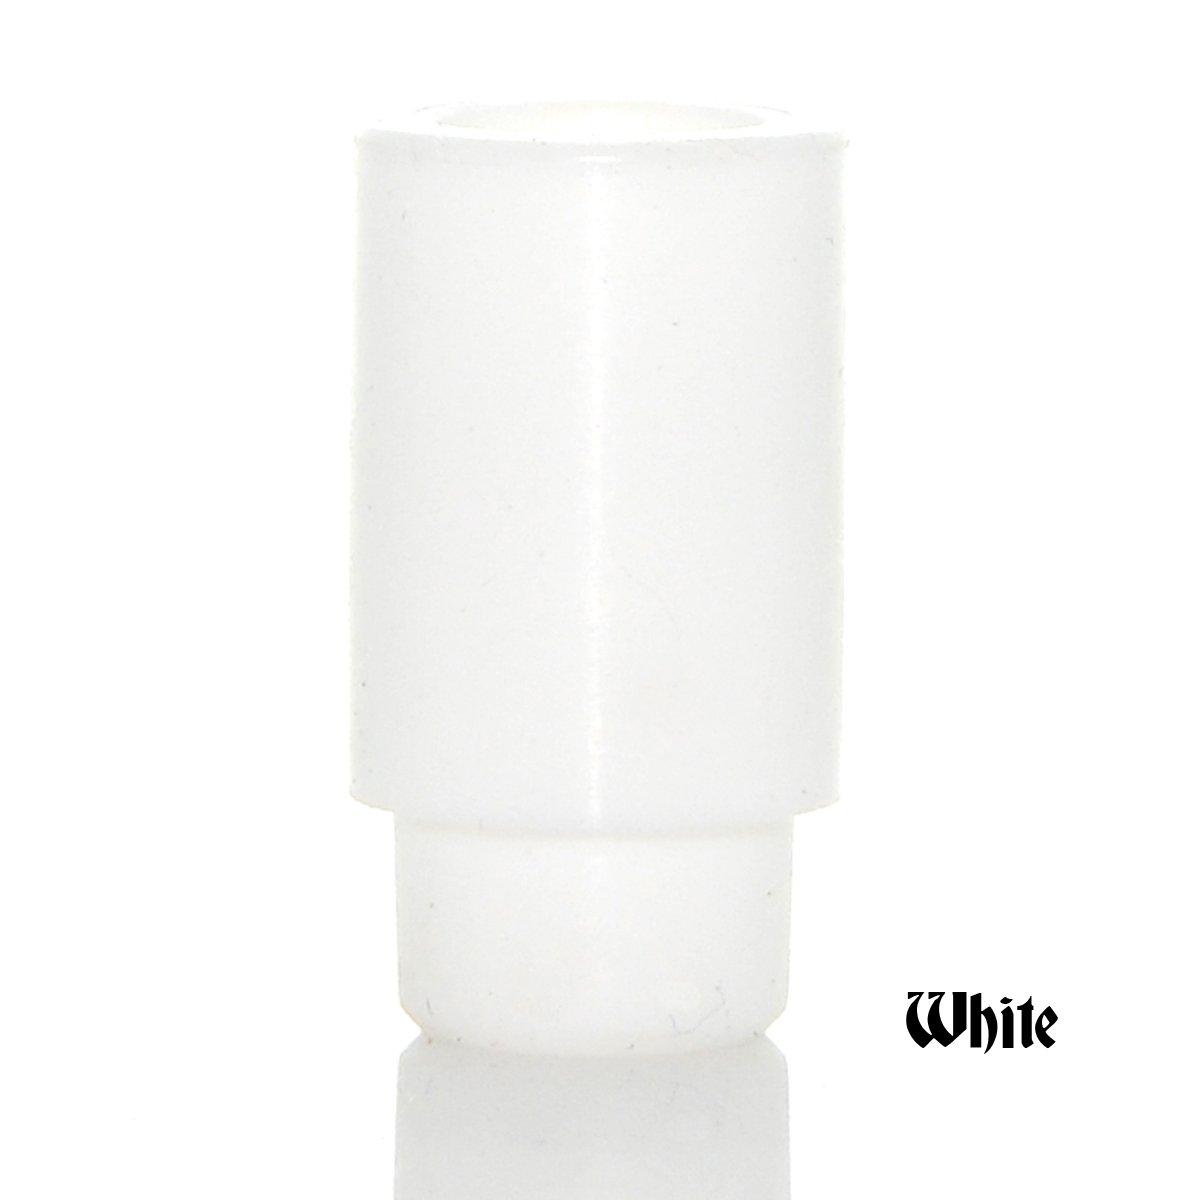 Flexible Wide 510 Drip Tip